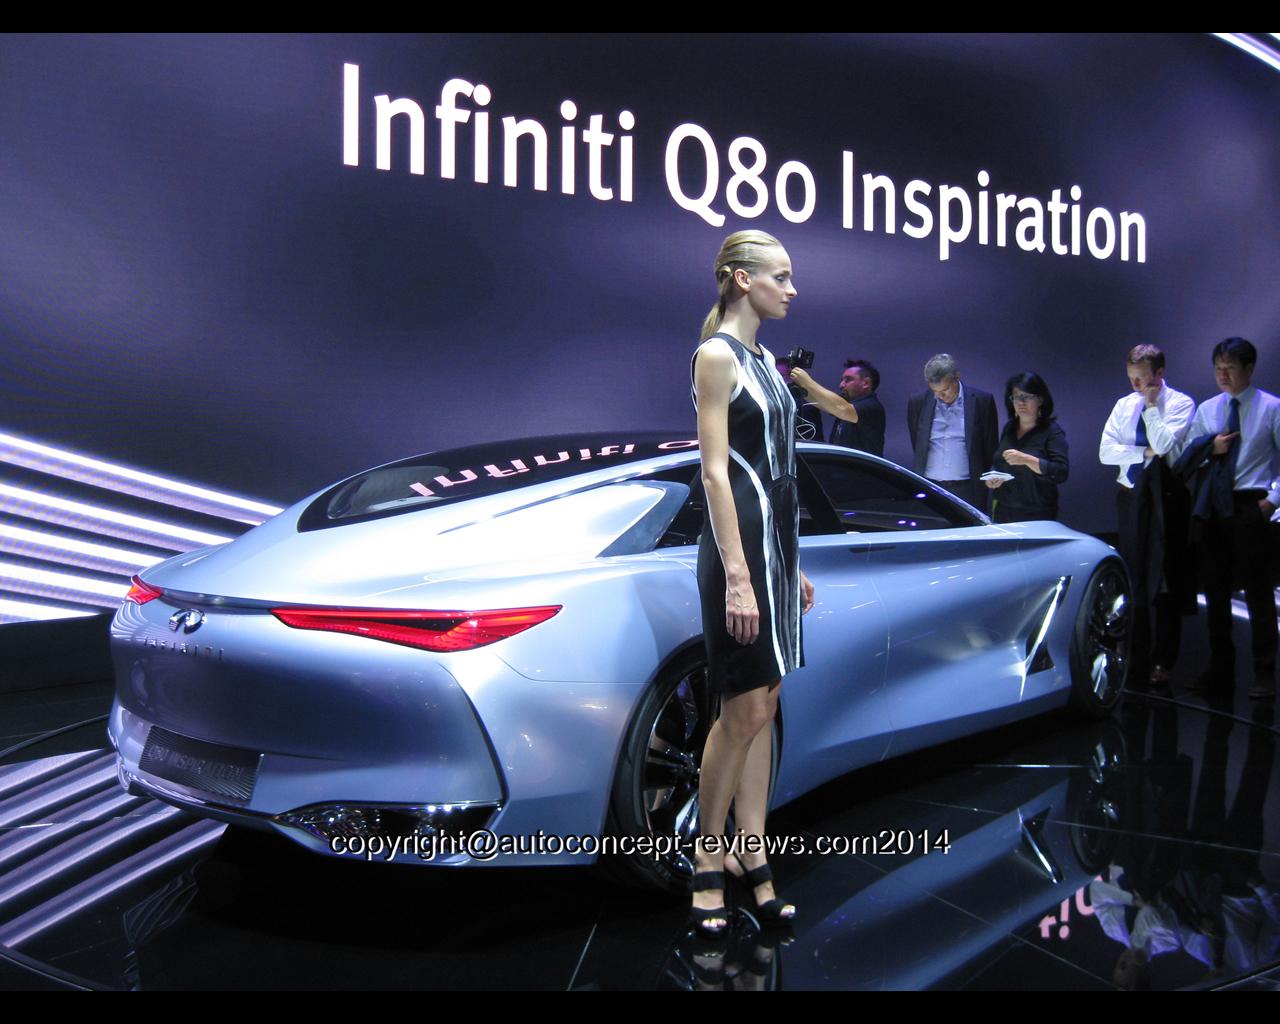 Infiniti Q80 Concept 2014 Wallpapers